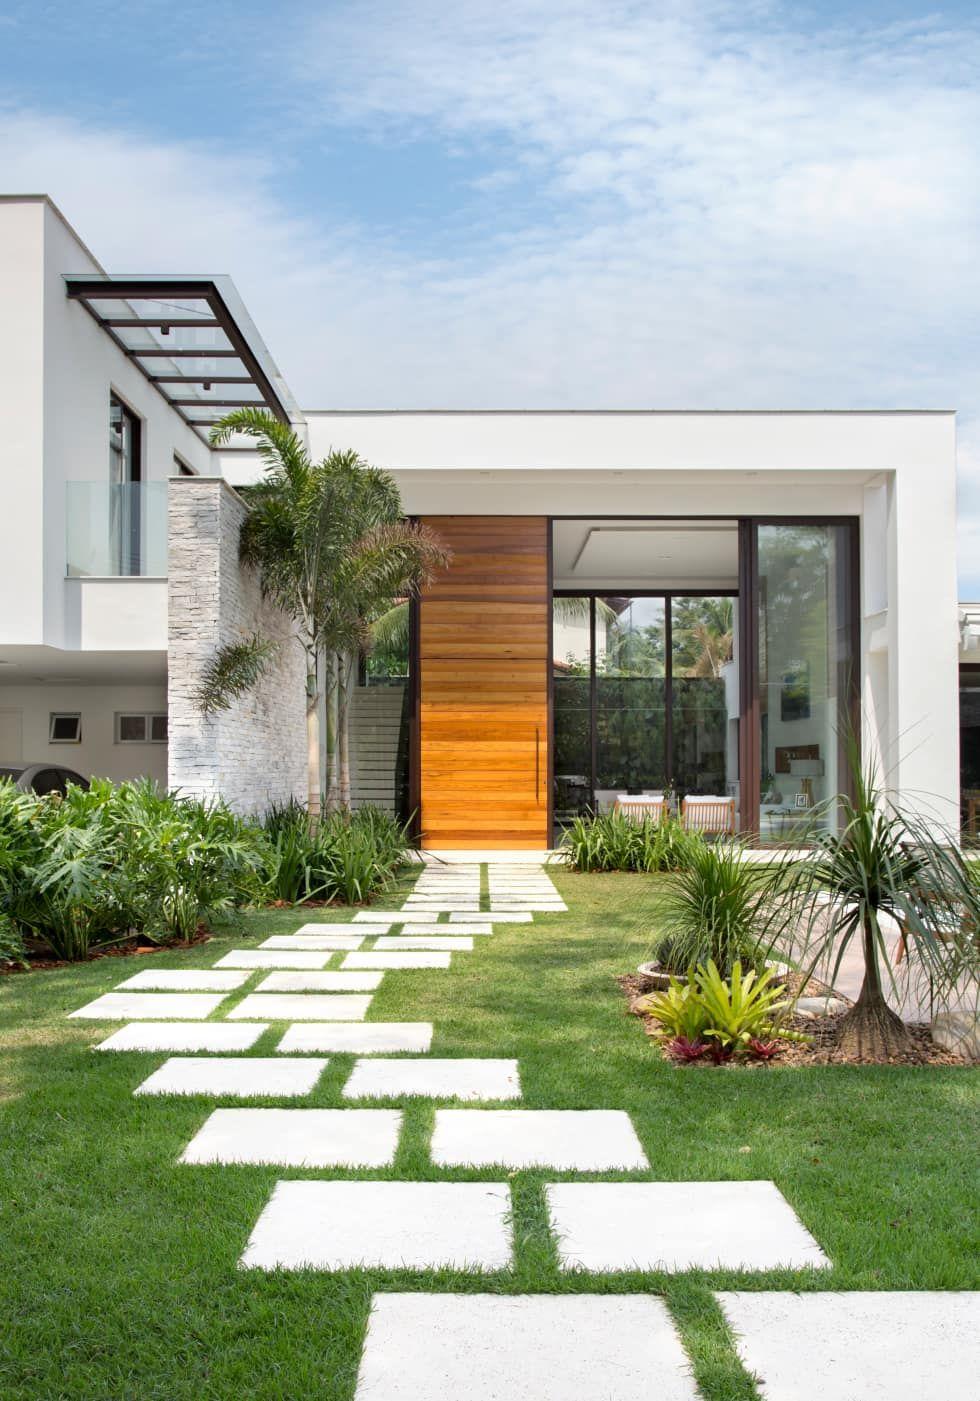 Fachada casa casas por amanda miranda arquitetura for Casa moderna jardines